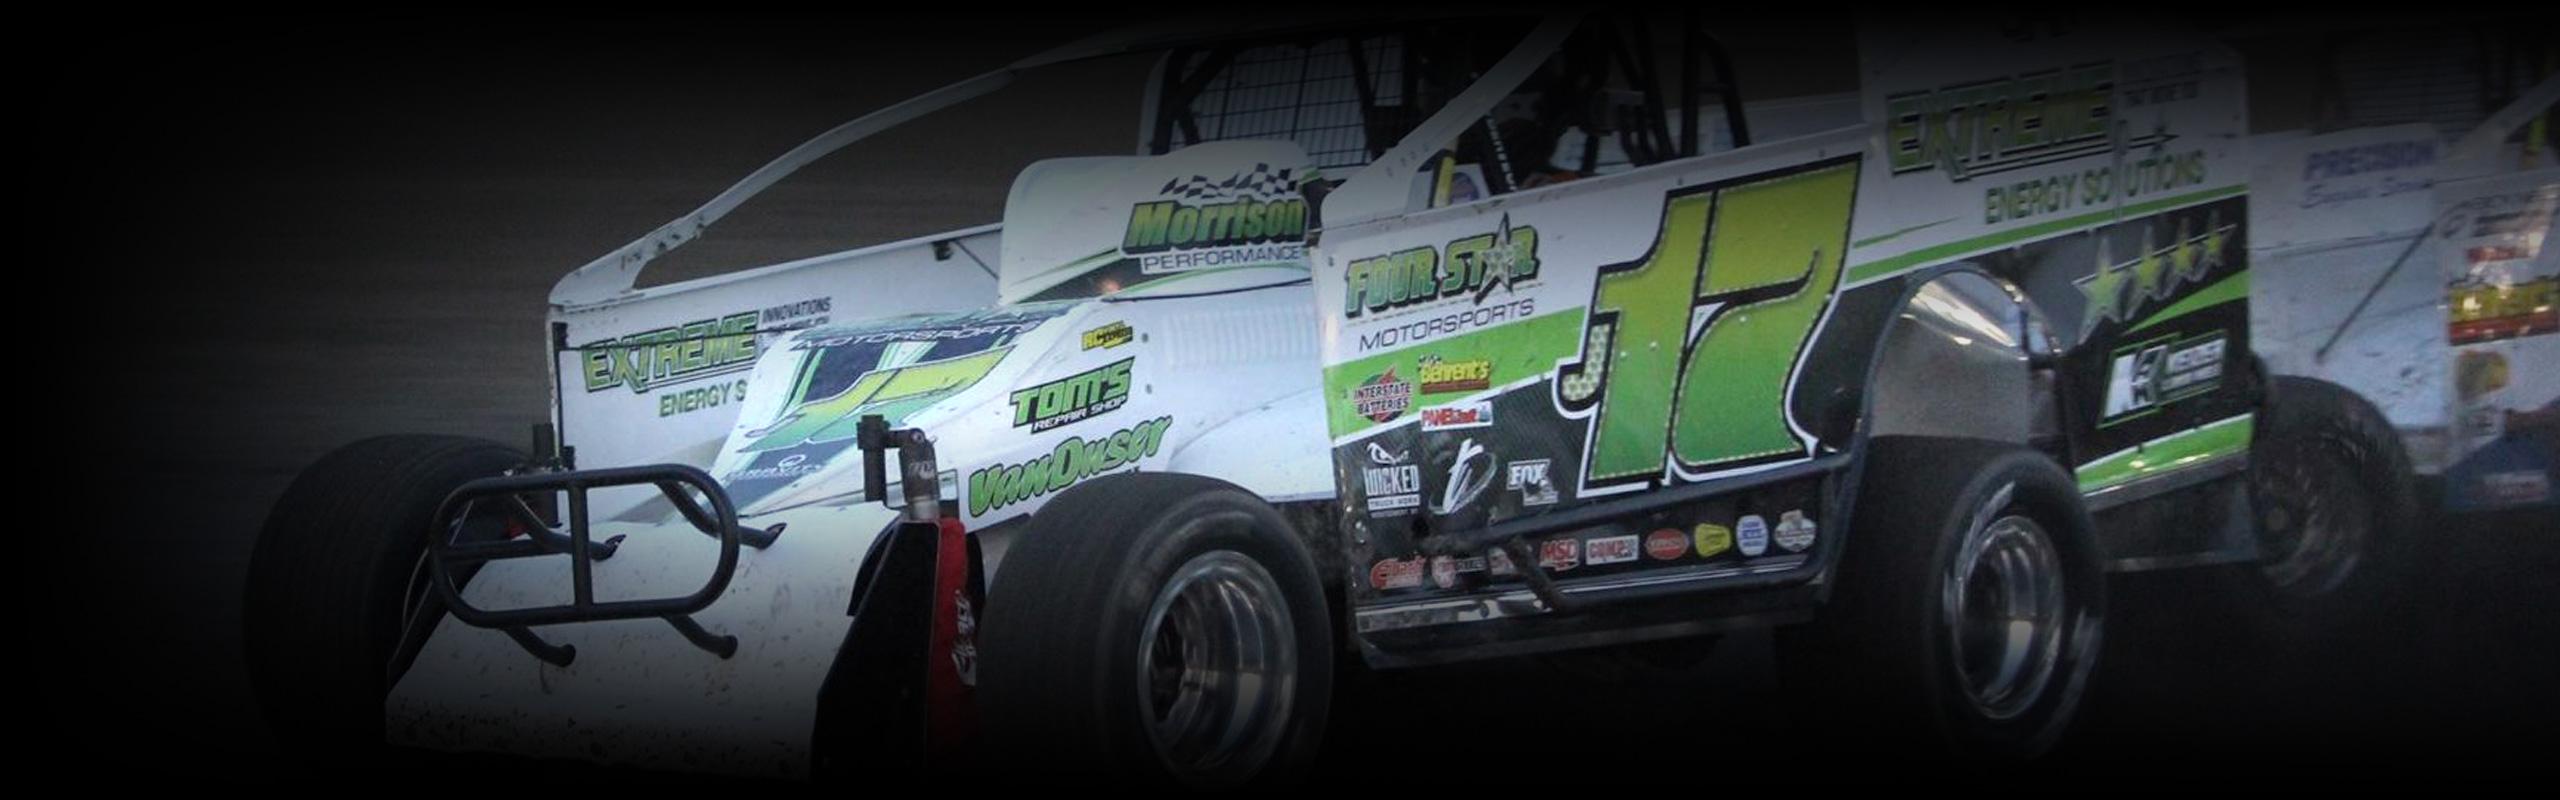 Jeff Heotzler Racing